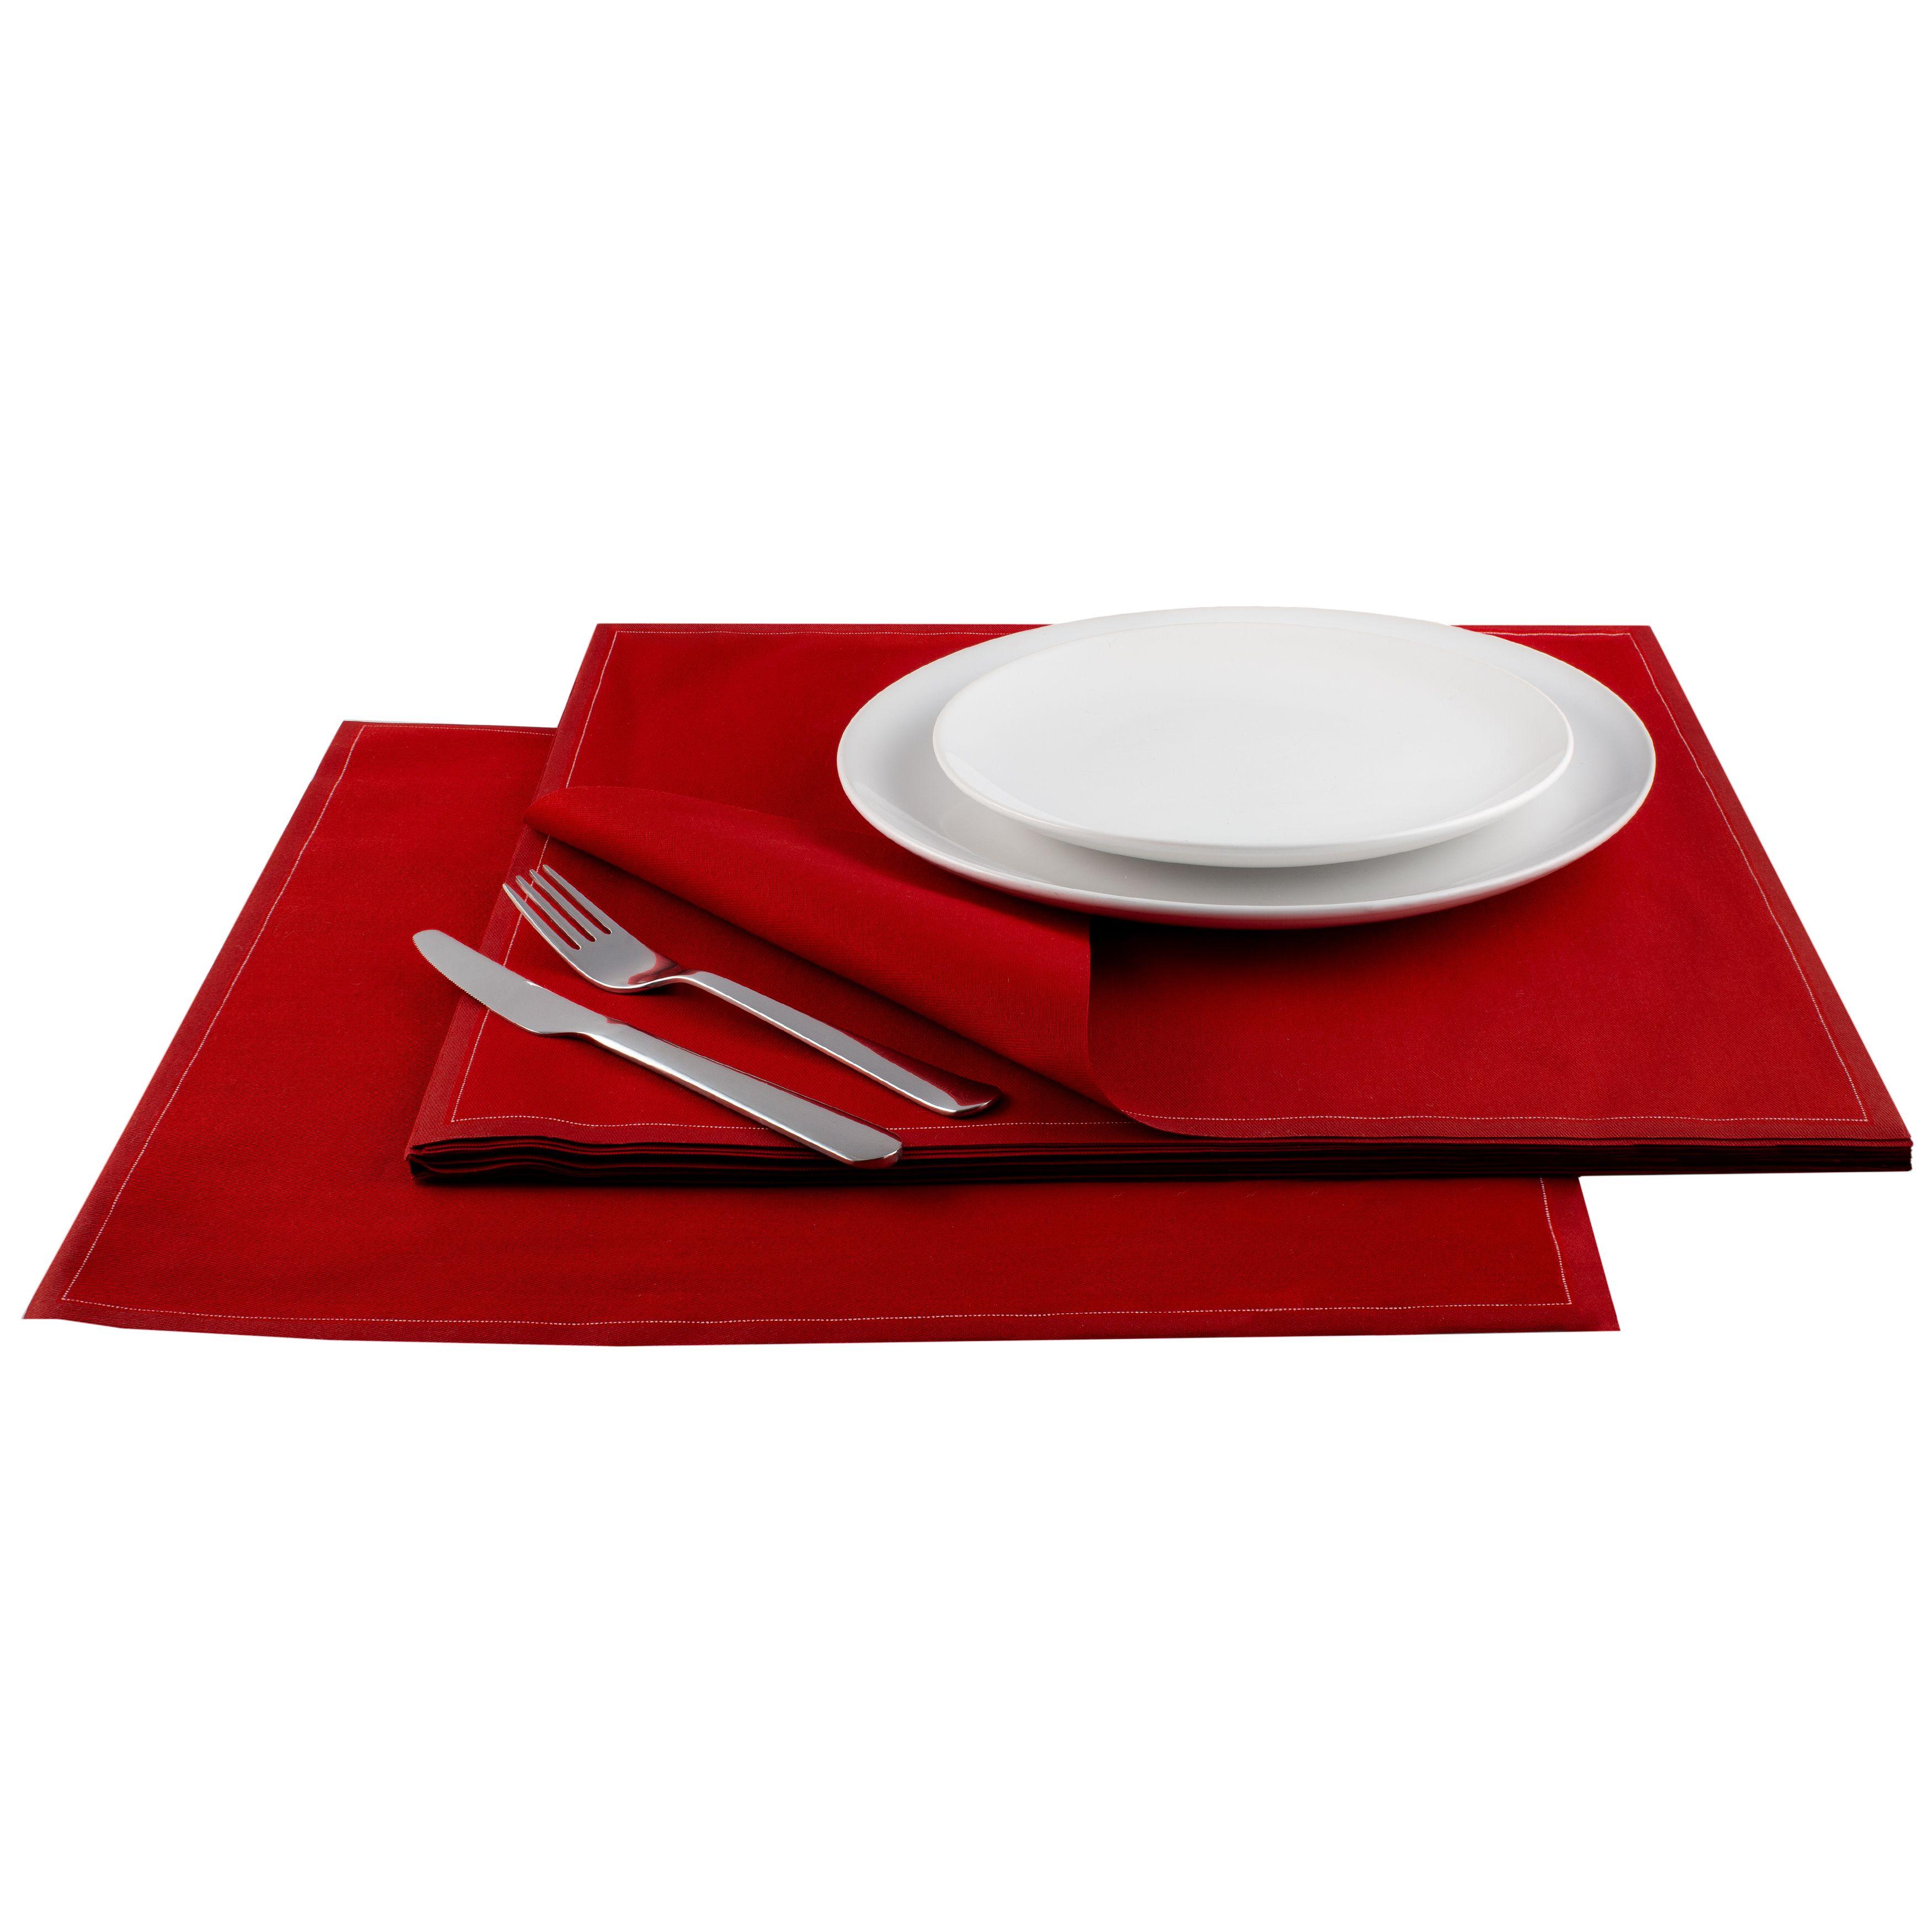 "Red Cotton Premium Dinner (200 GSM) - 15.8"" x 15.8"" - 250 Units"